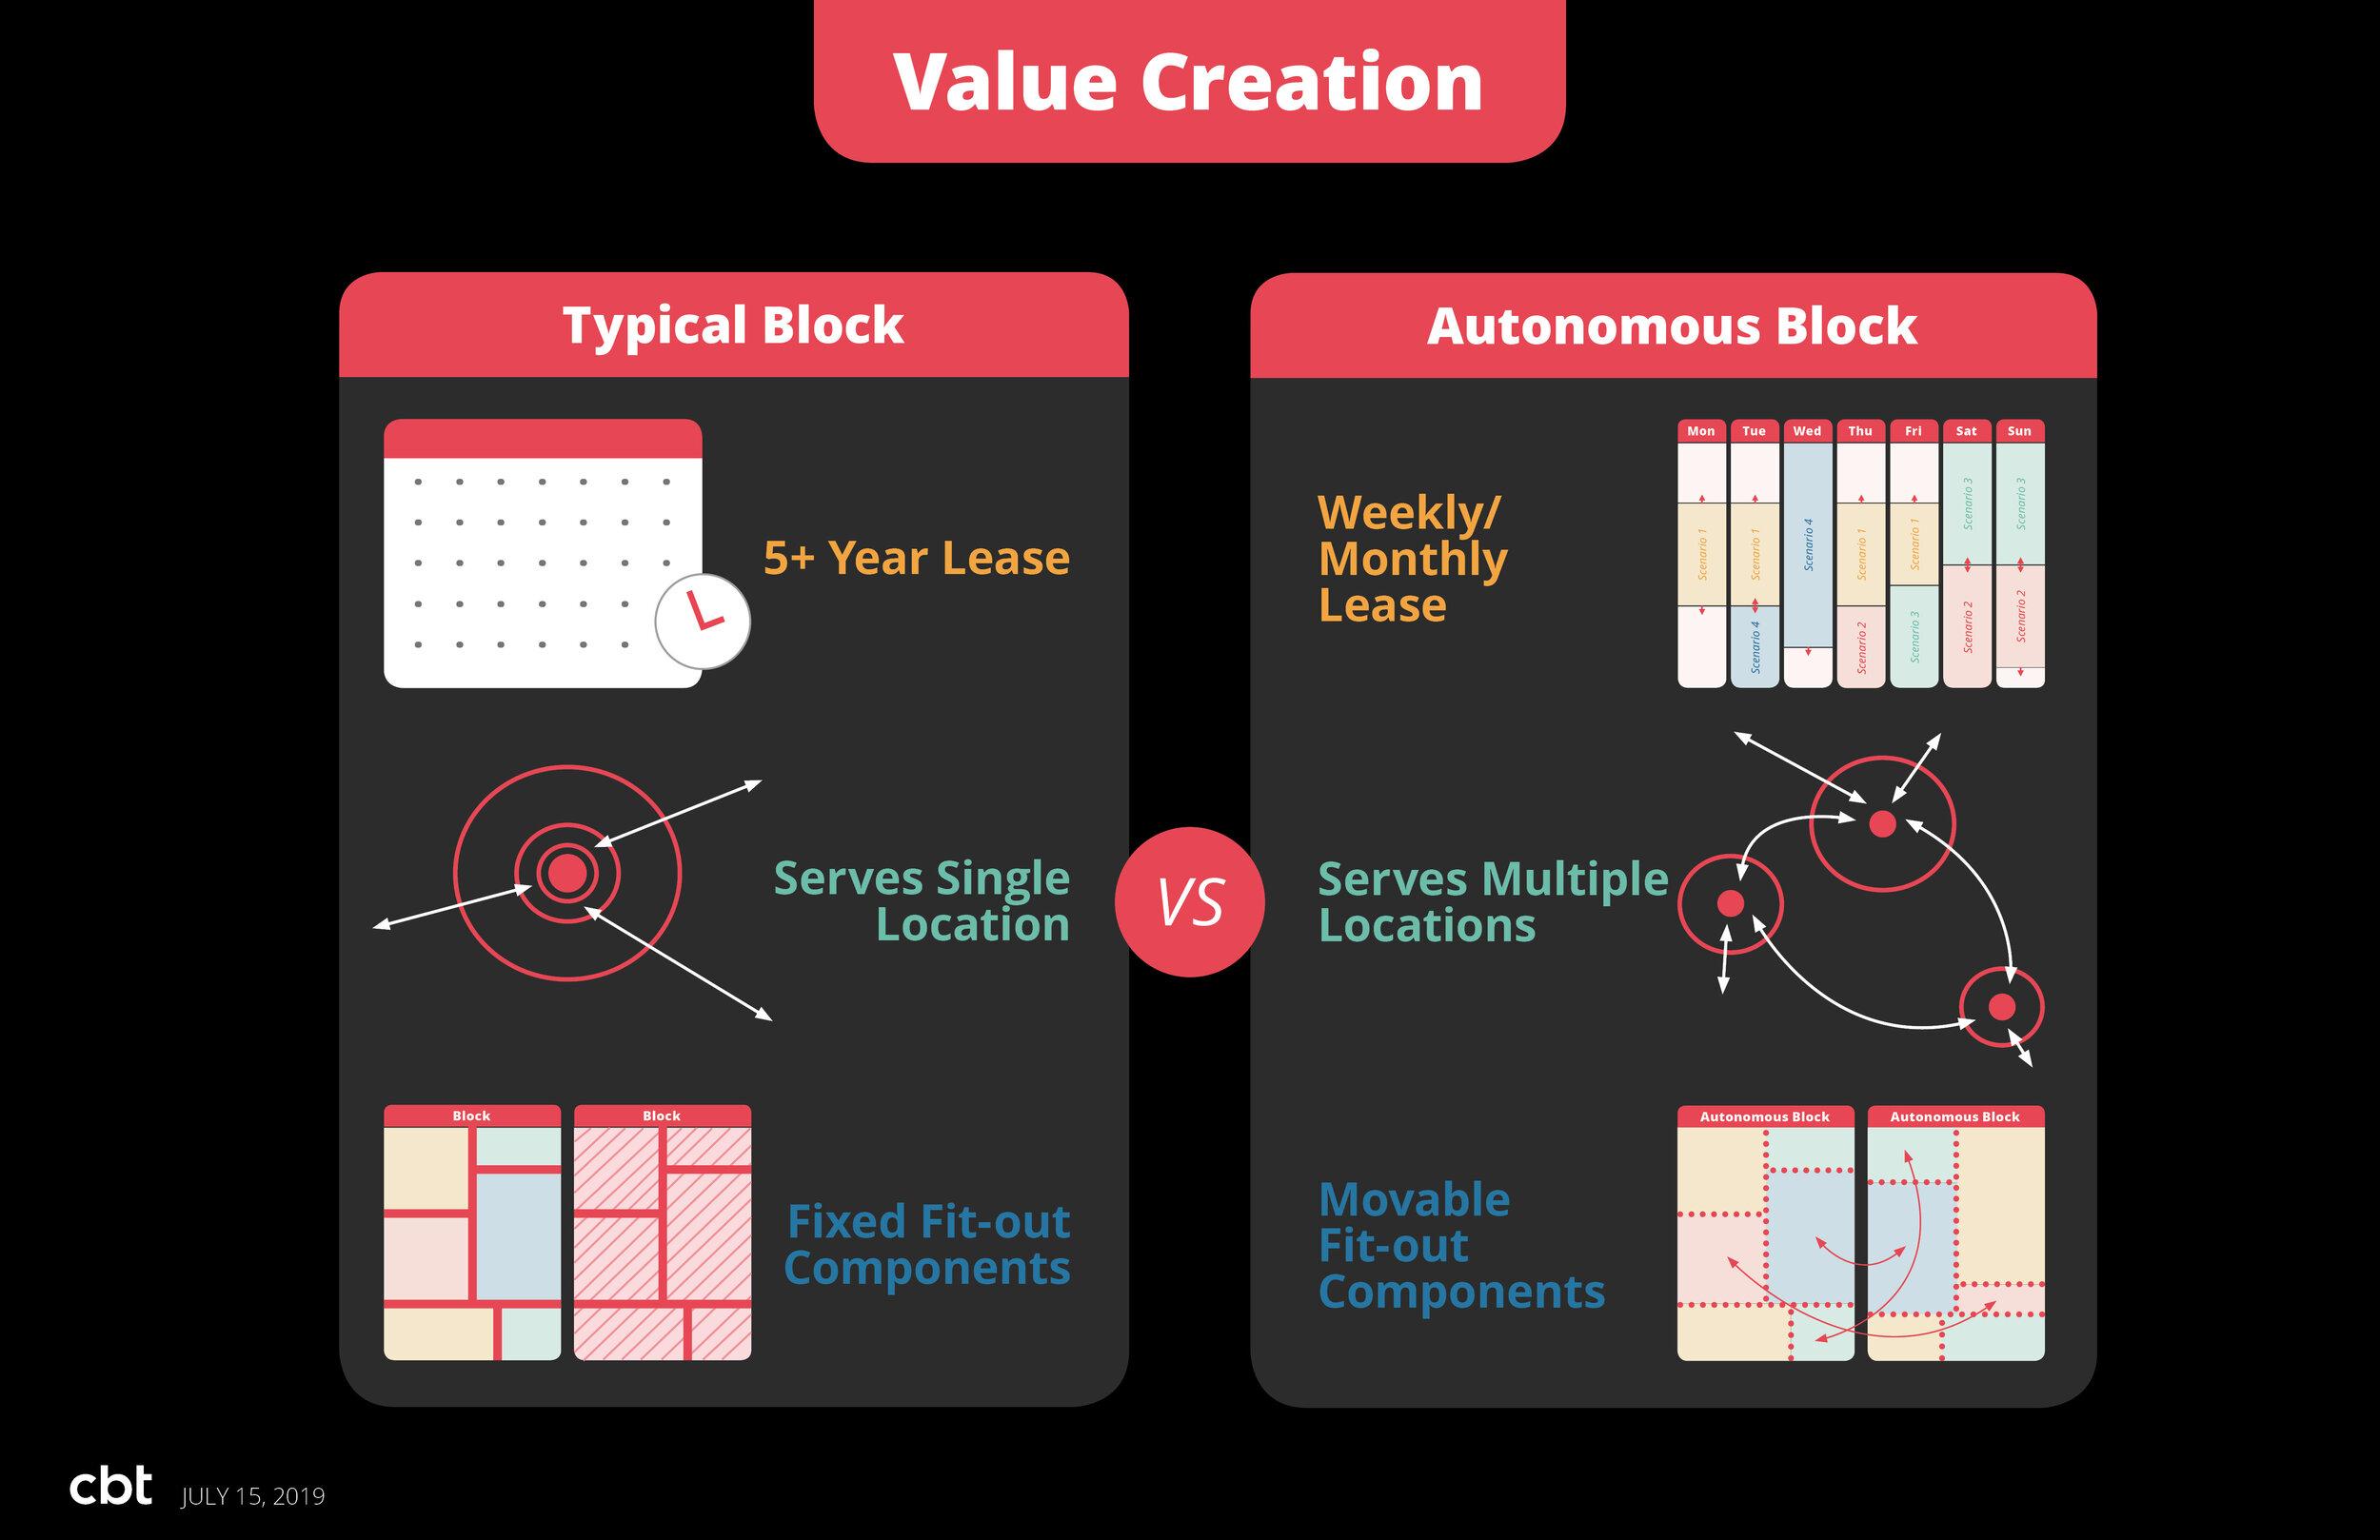 2019_07_14_Autonomous-Block_Presentation_V2_51.jpg